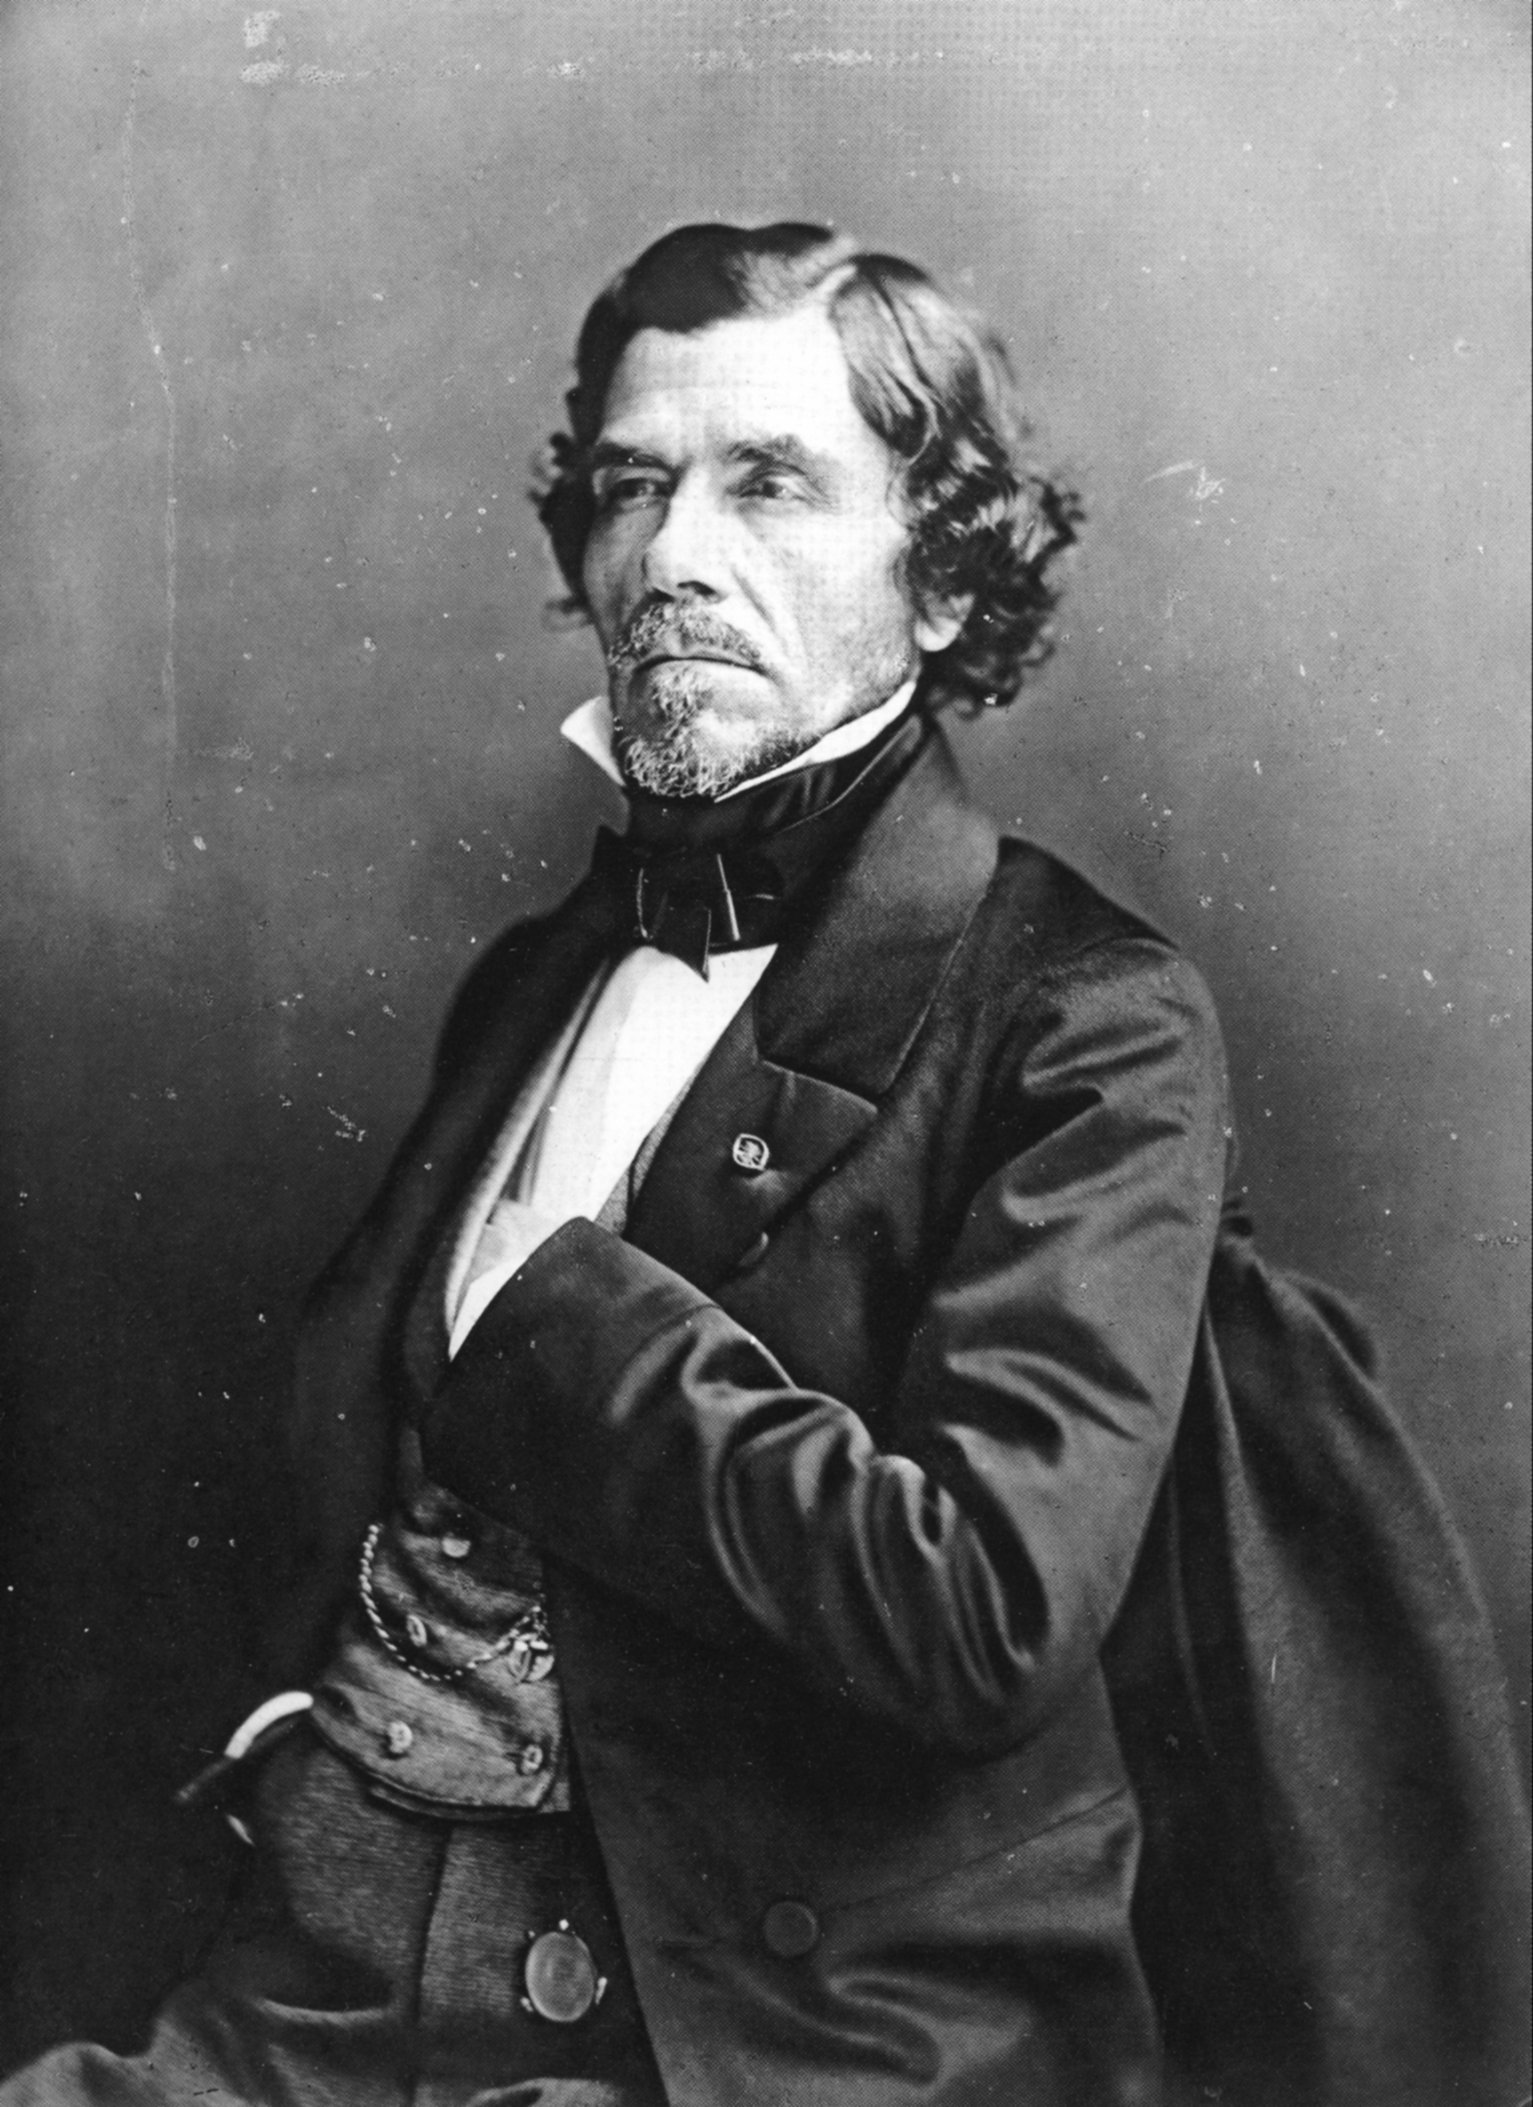 Félix_Nadar_1820-1910_portraits_Eugène_Delacroix.jpg